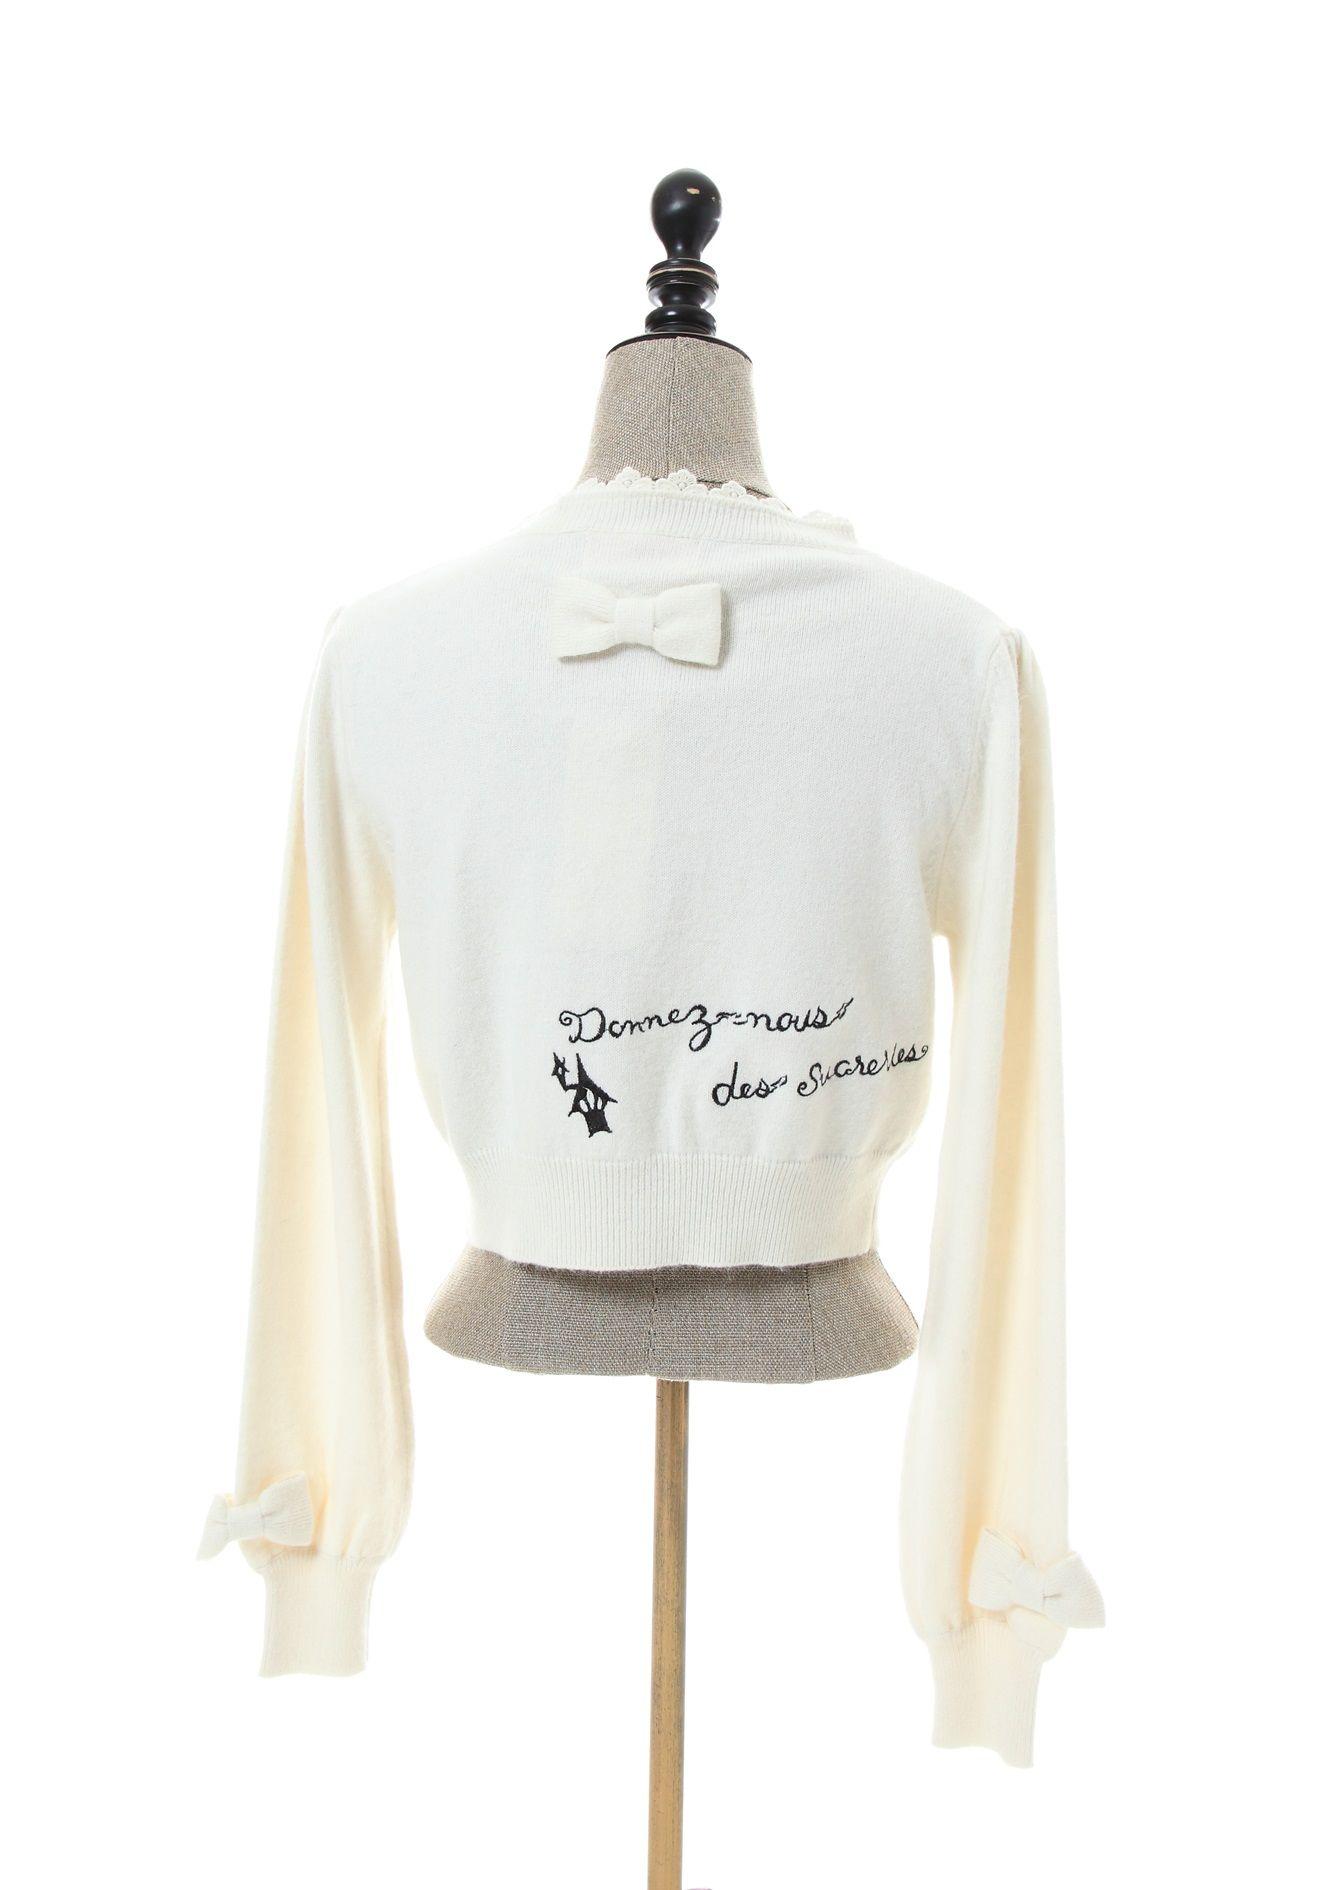 axes femme online shop|アンゴラ混刺繍入カーディガン